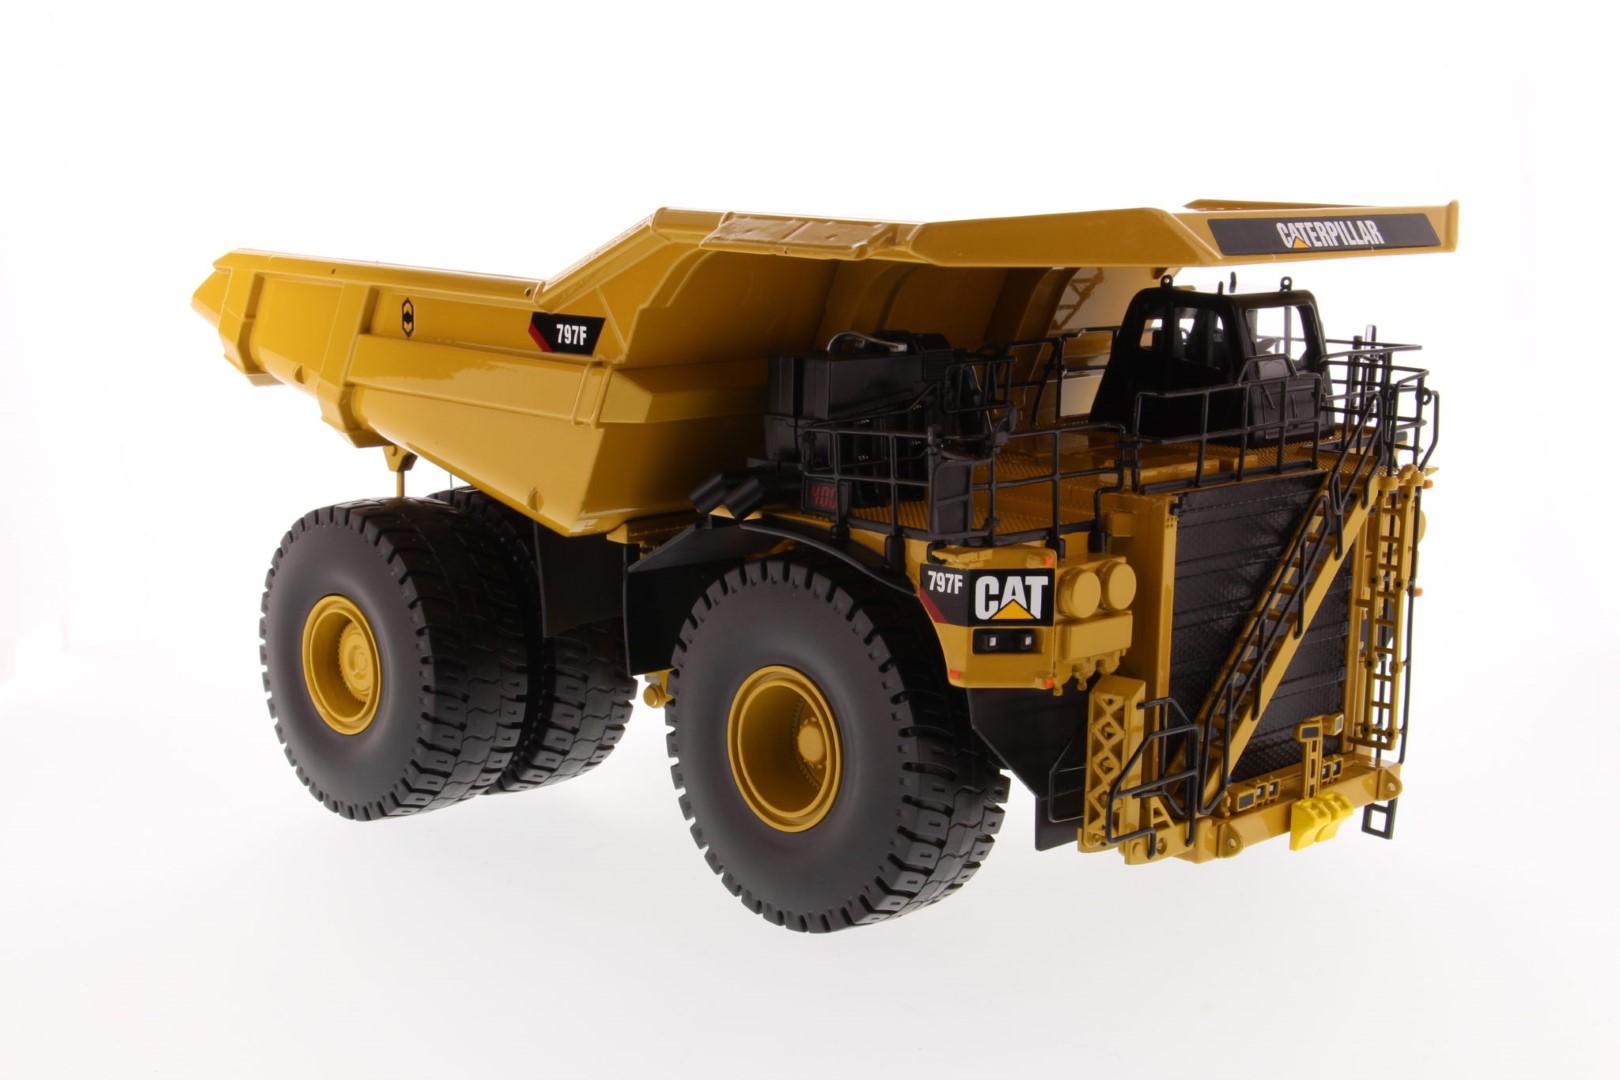 Diecast Masters CAT 797F Tier 4 Mining Truck - Image 5 of 5